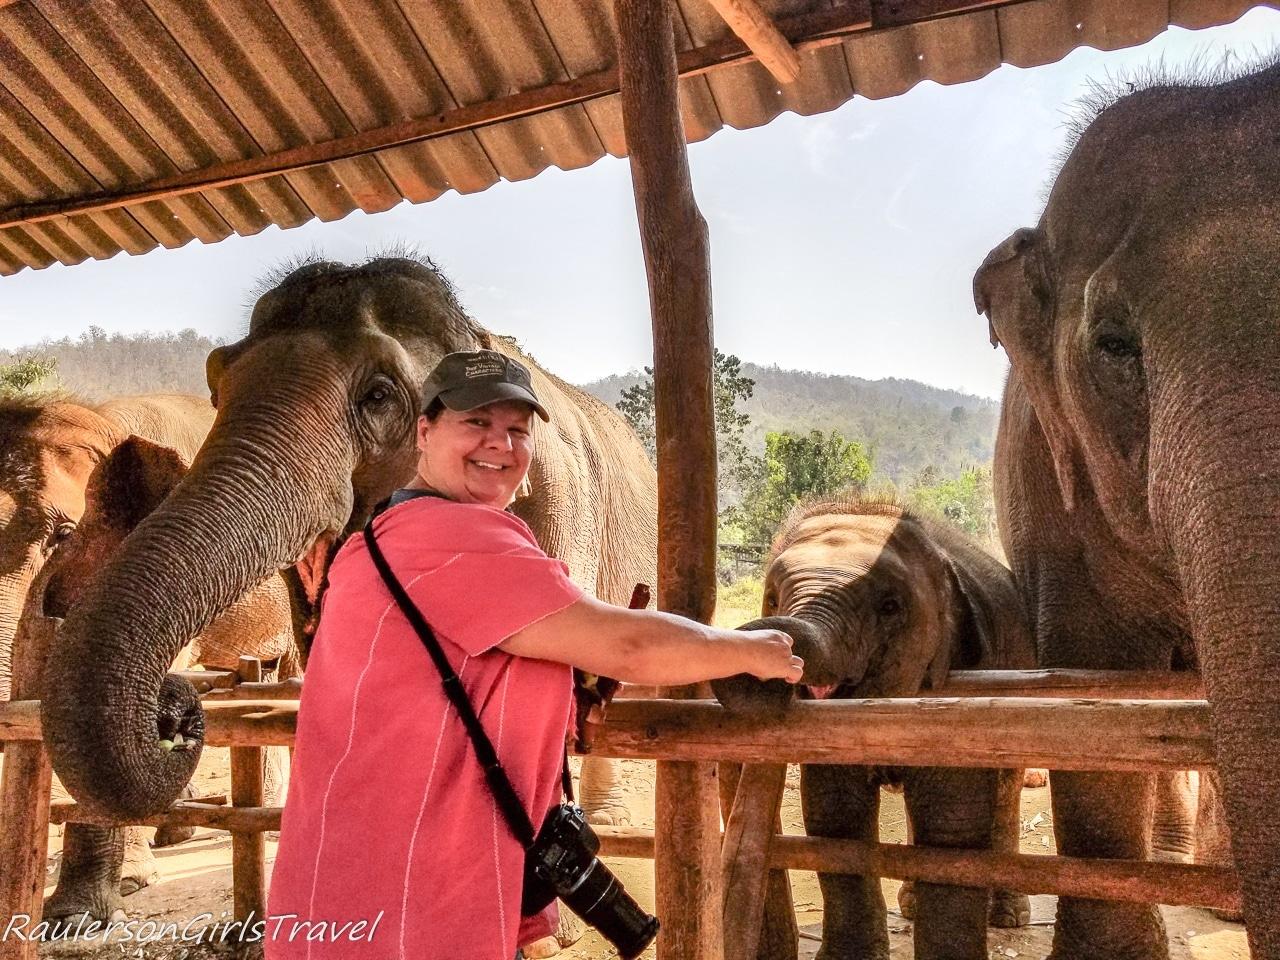 Heather feeding the baby elephant